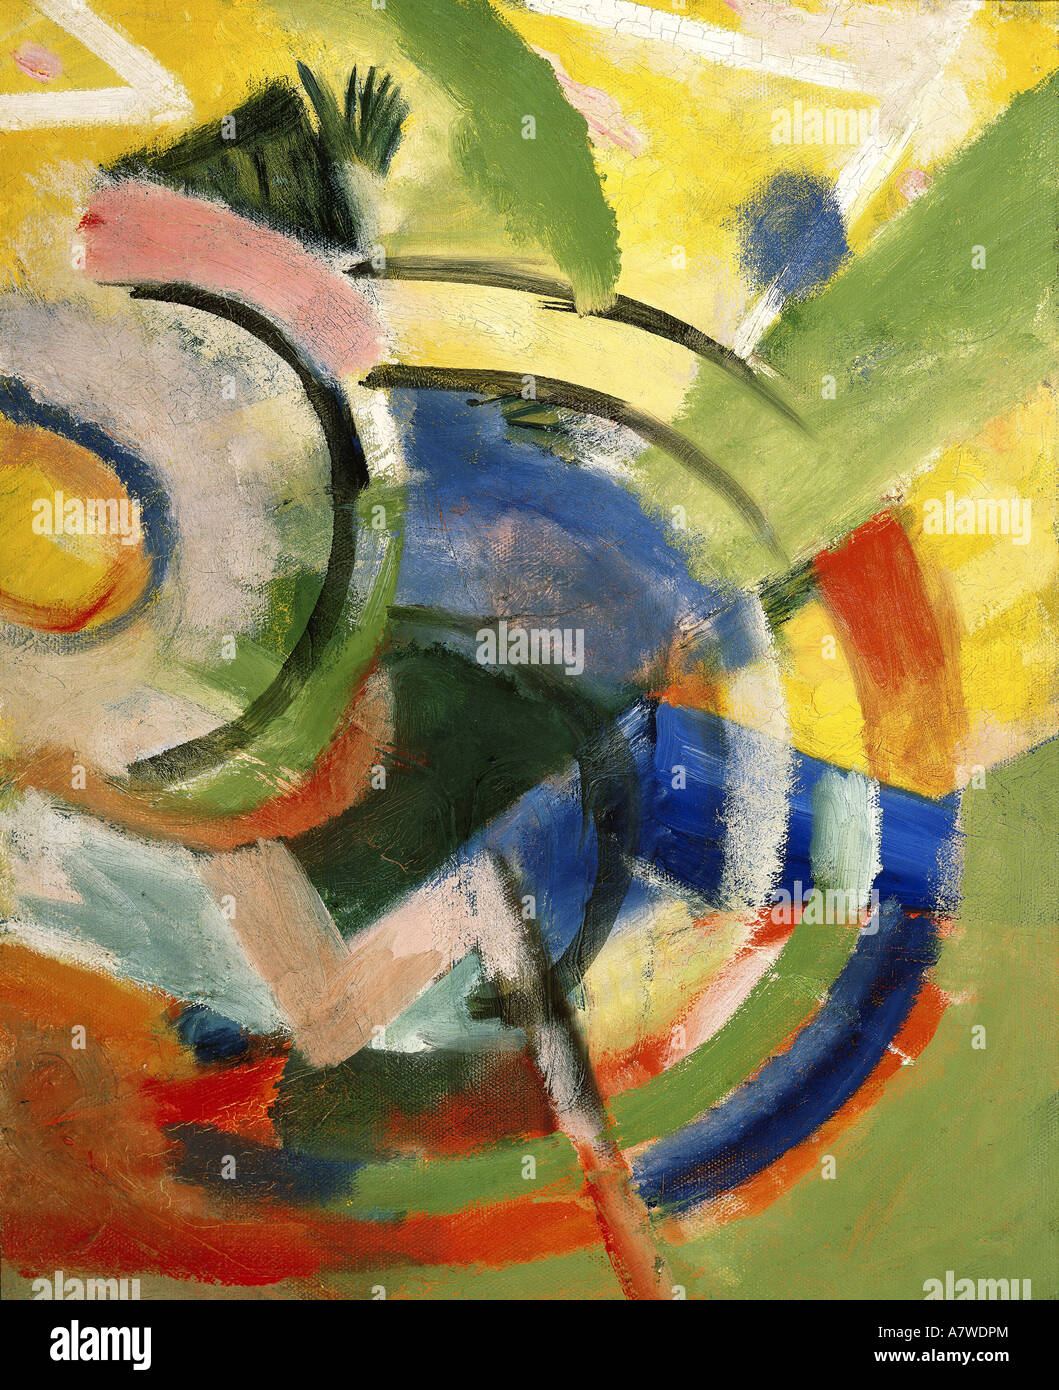 """Fine Arts, Marc Franz (1880 - 1916), 'Kleine Komposition IV"", pintura, 1914, Franz Marc Museu, Kochel Imagens de Stock"